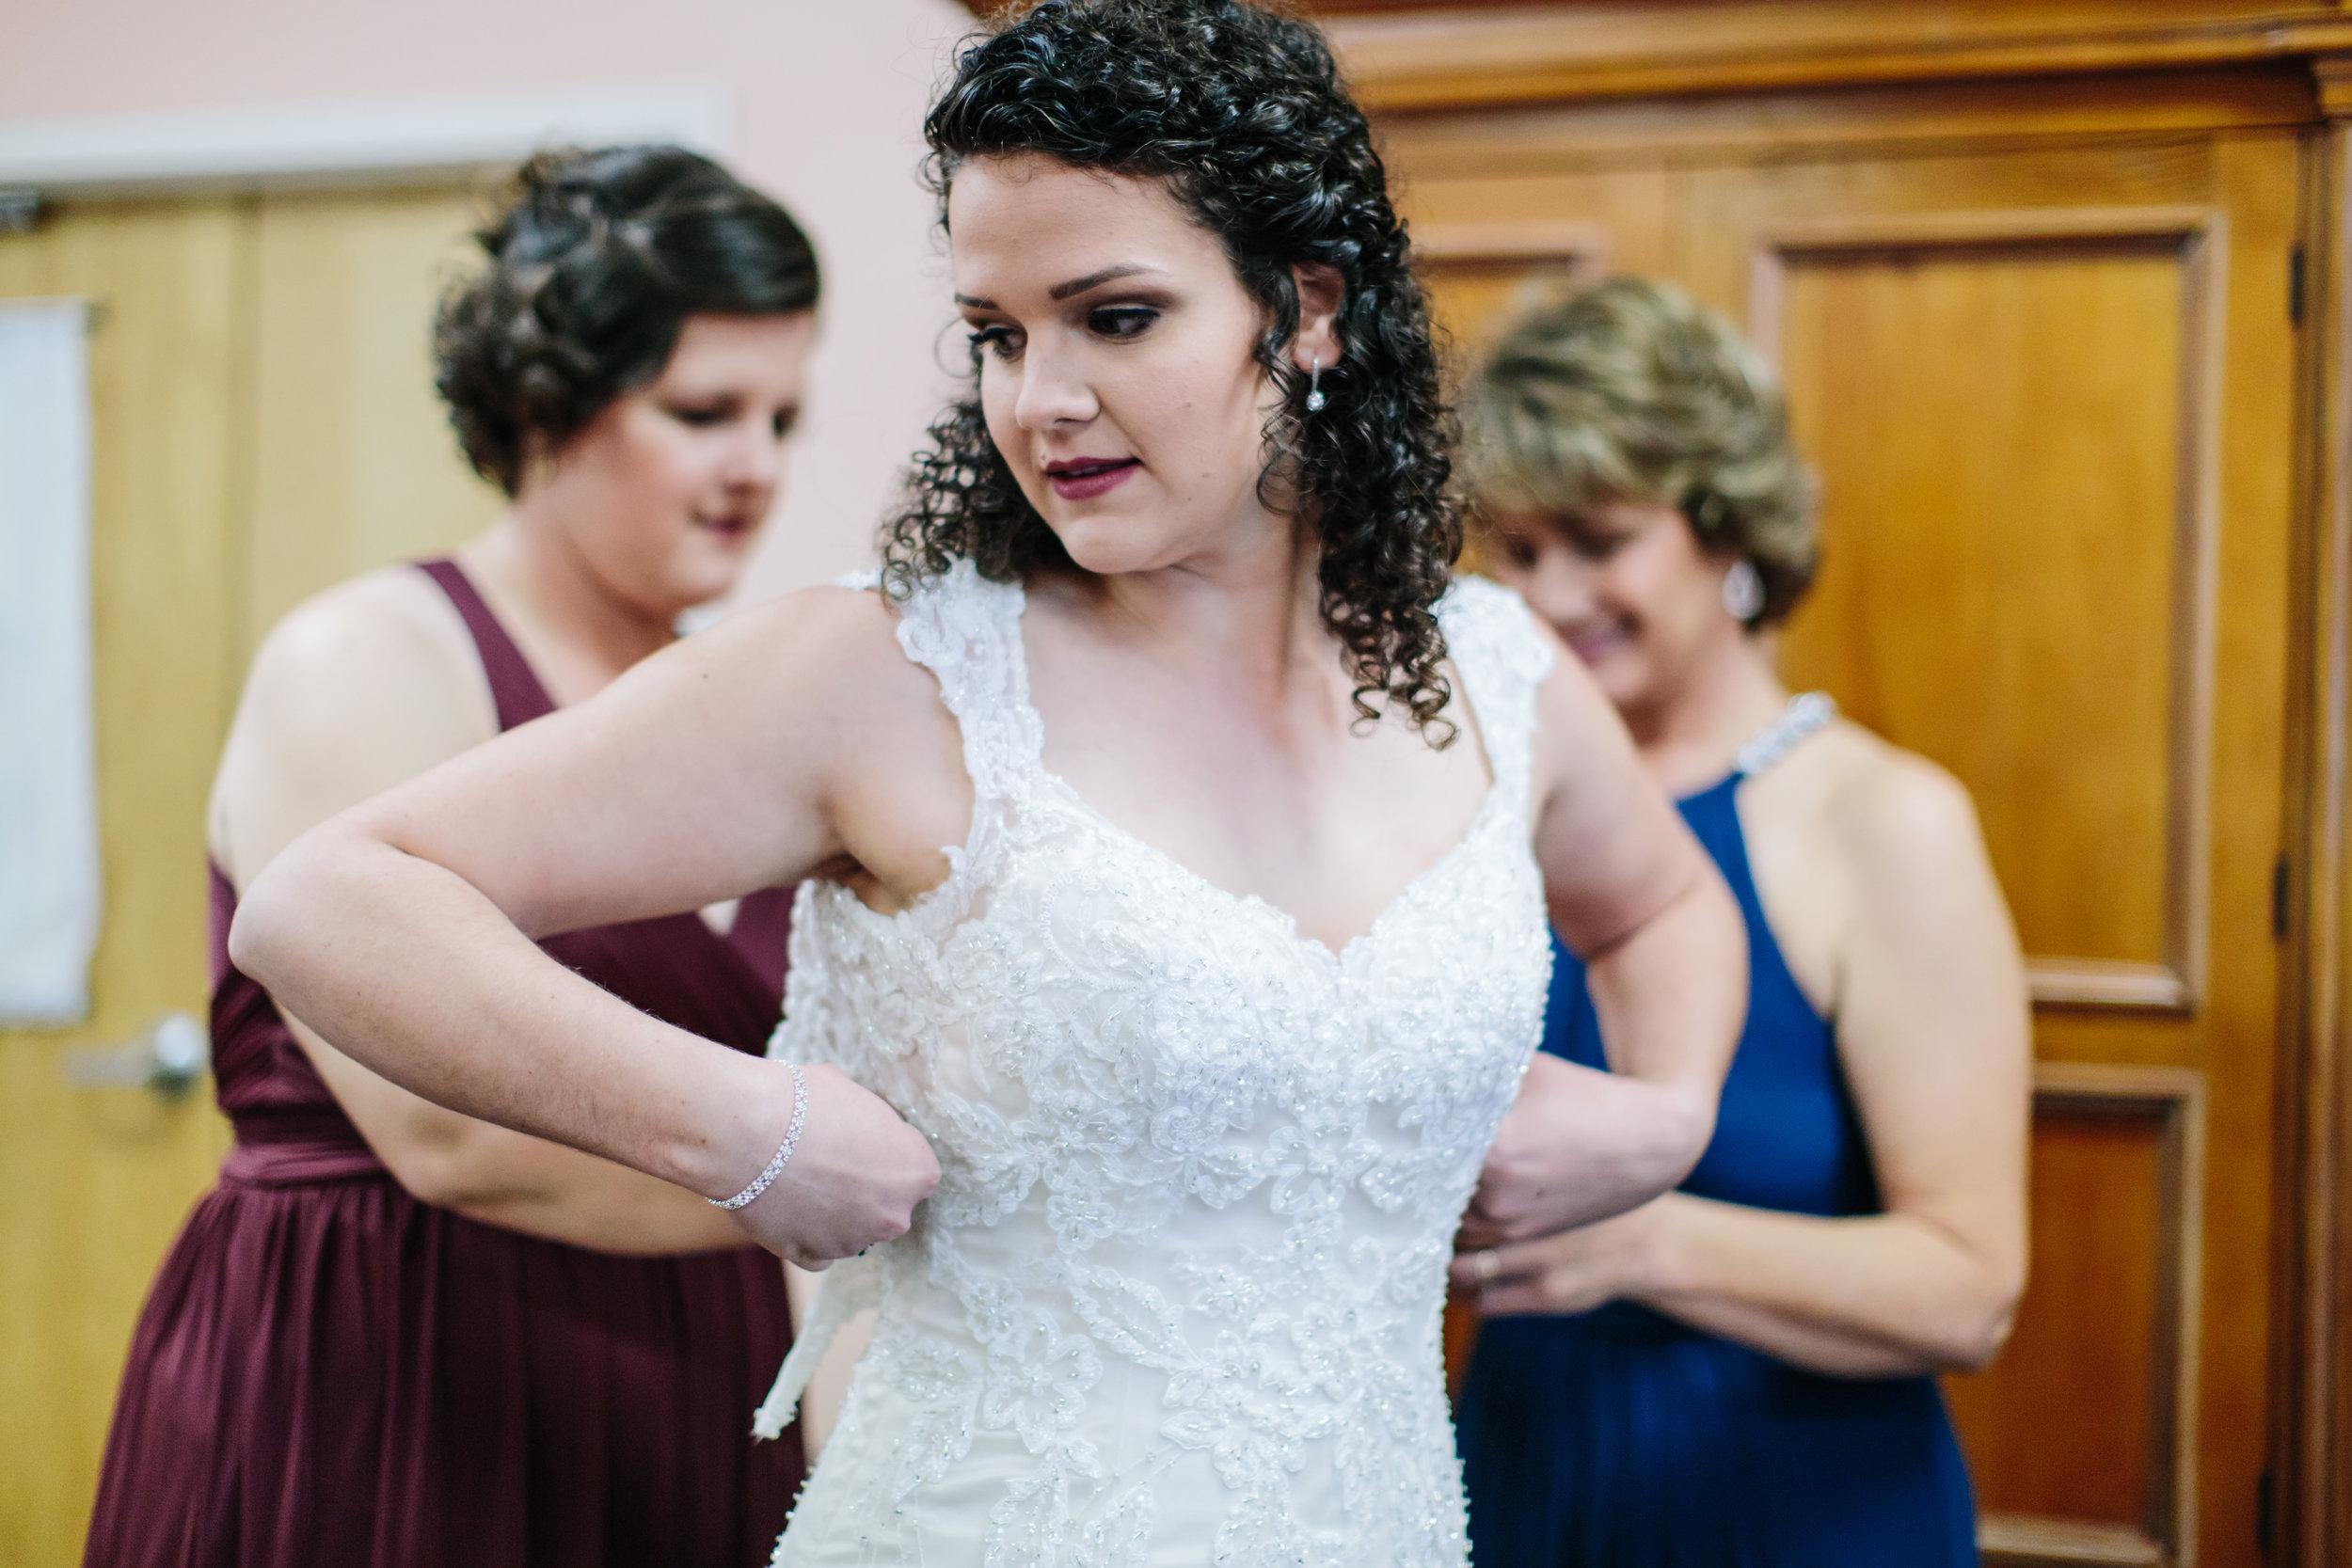 2018.03.17 Allison and Chuck Wedding Waelti Melbourne (40 of 900).jpg